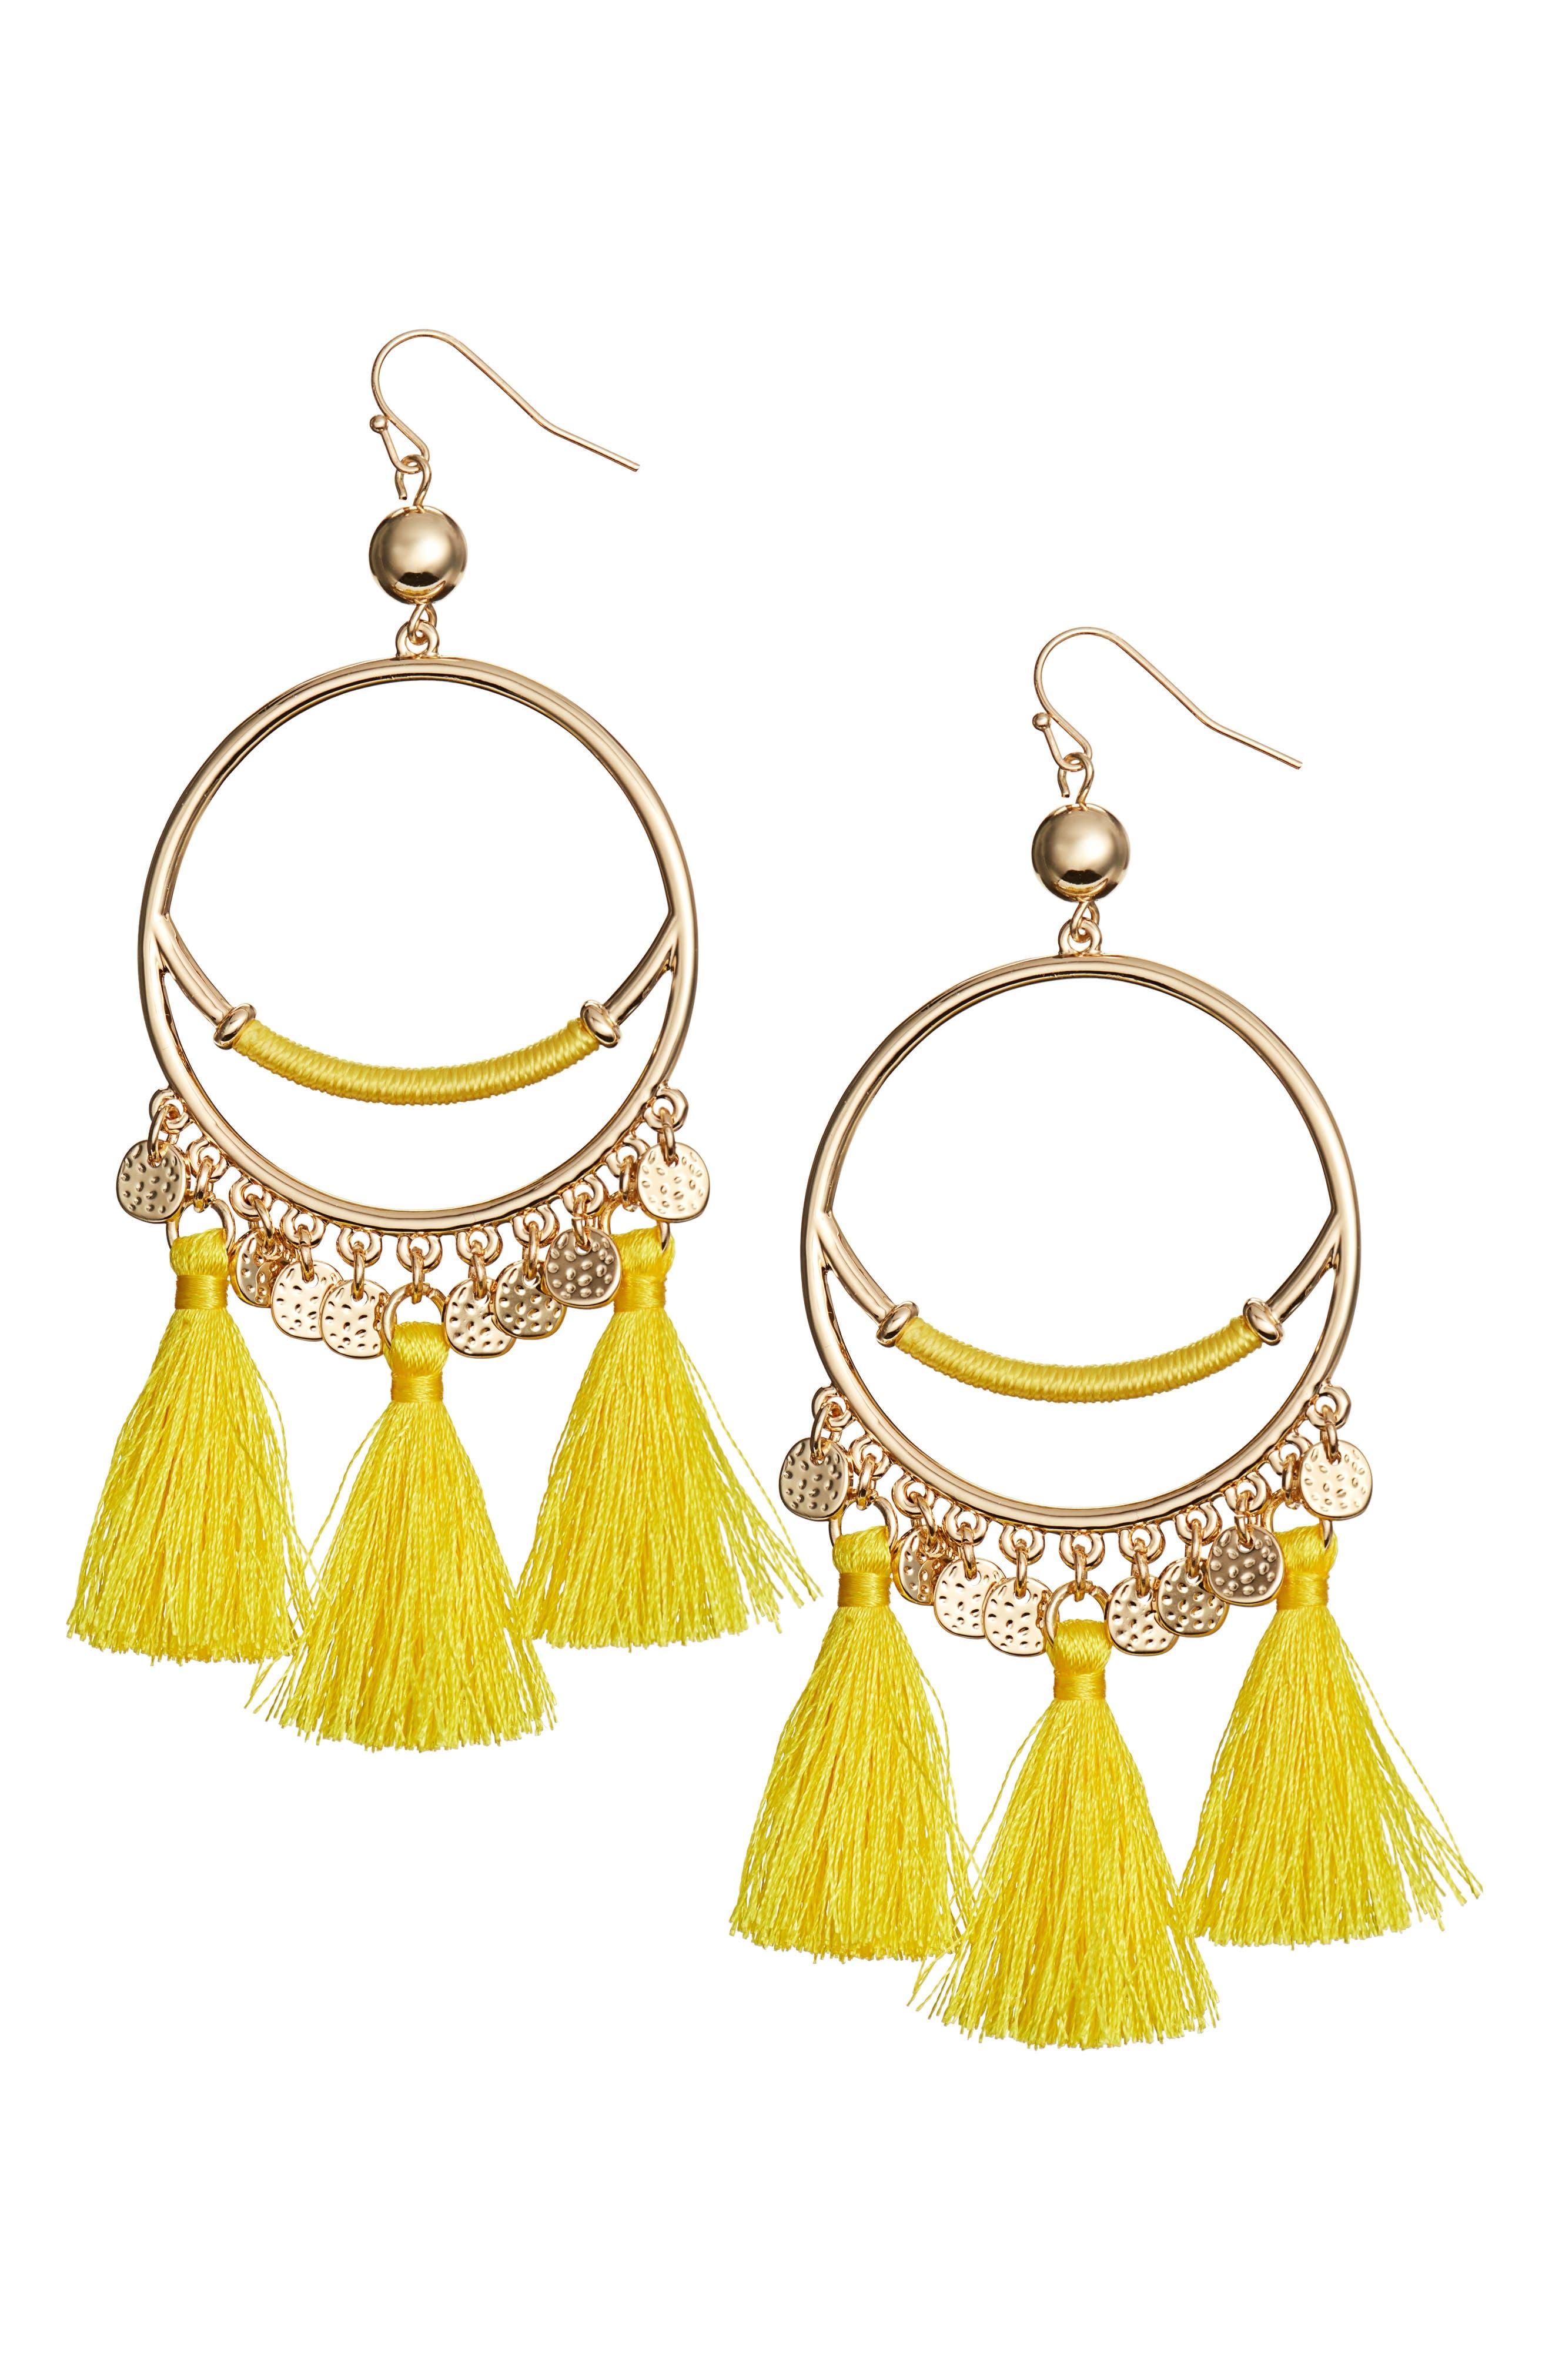 Lilly Pulitzer Surf Tassel Earrings